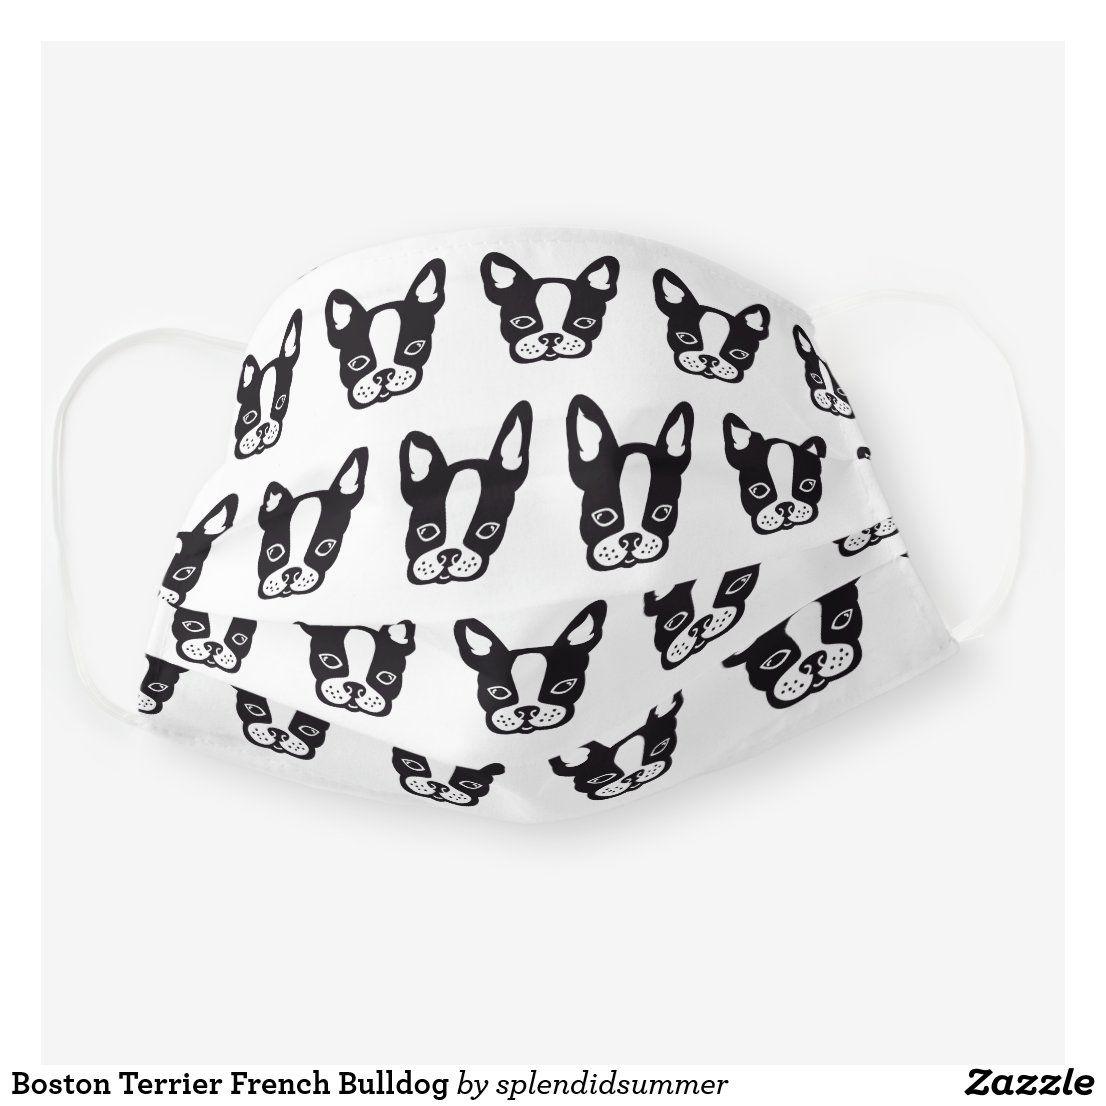 Boston Terrier French Bulldog Cloth Face Mask Zazzle Com In 2020 Face Mask Boston Terrier Bulldog